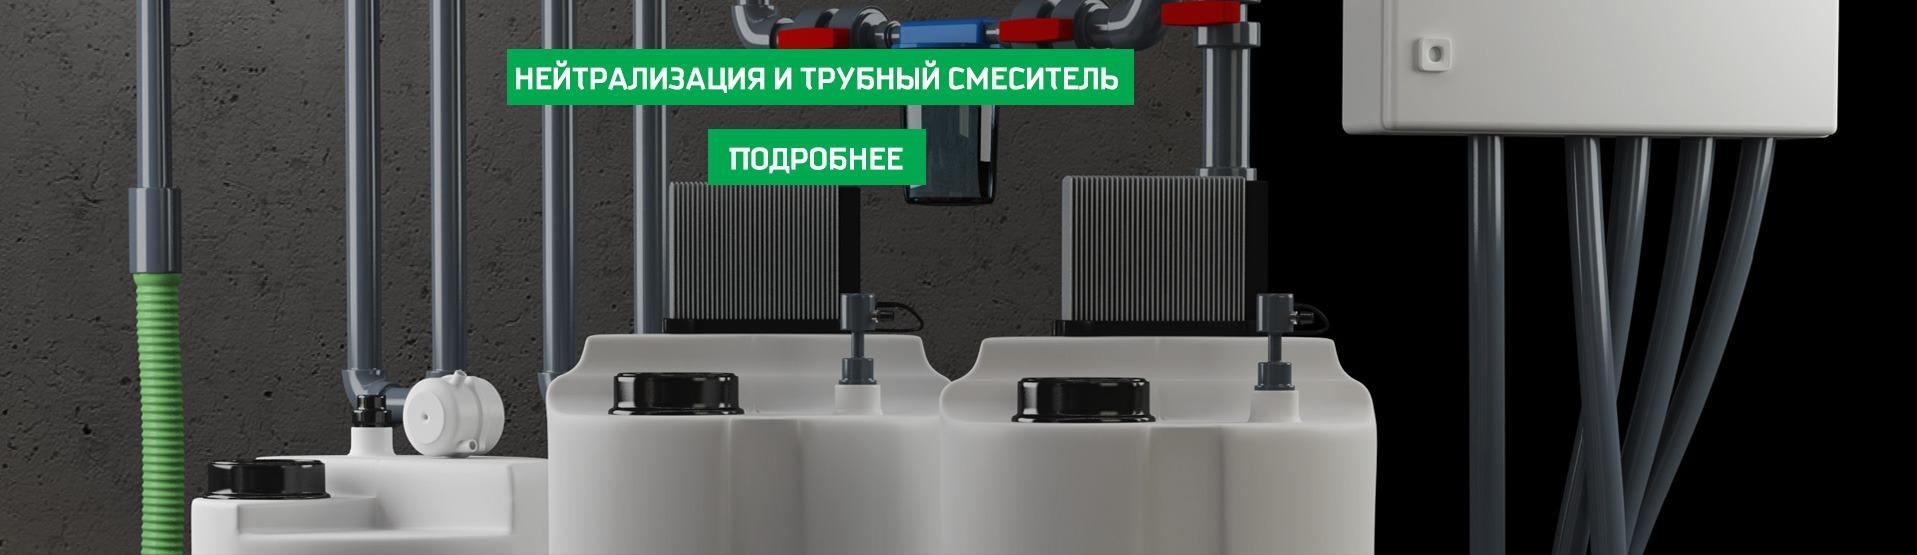 neutralizacija-ru